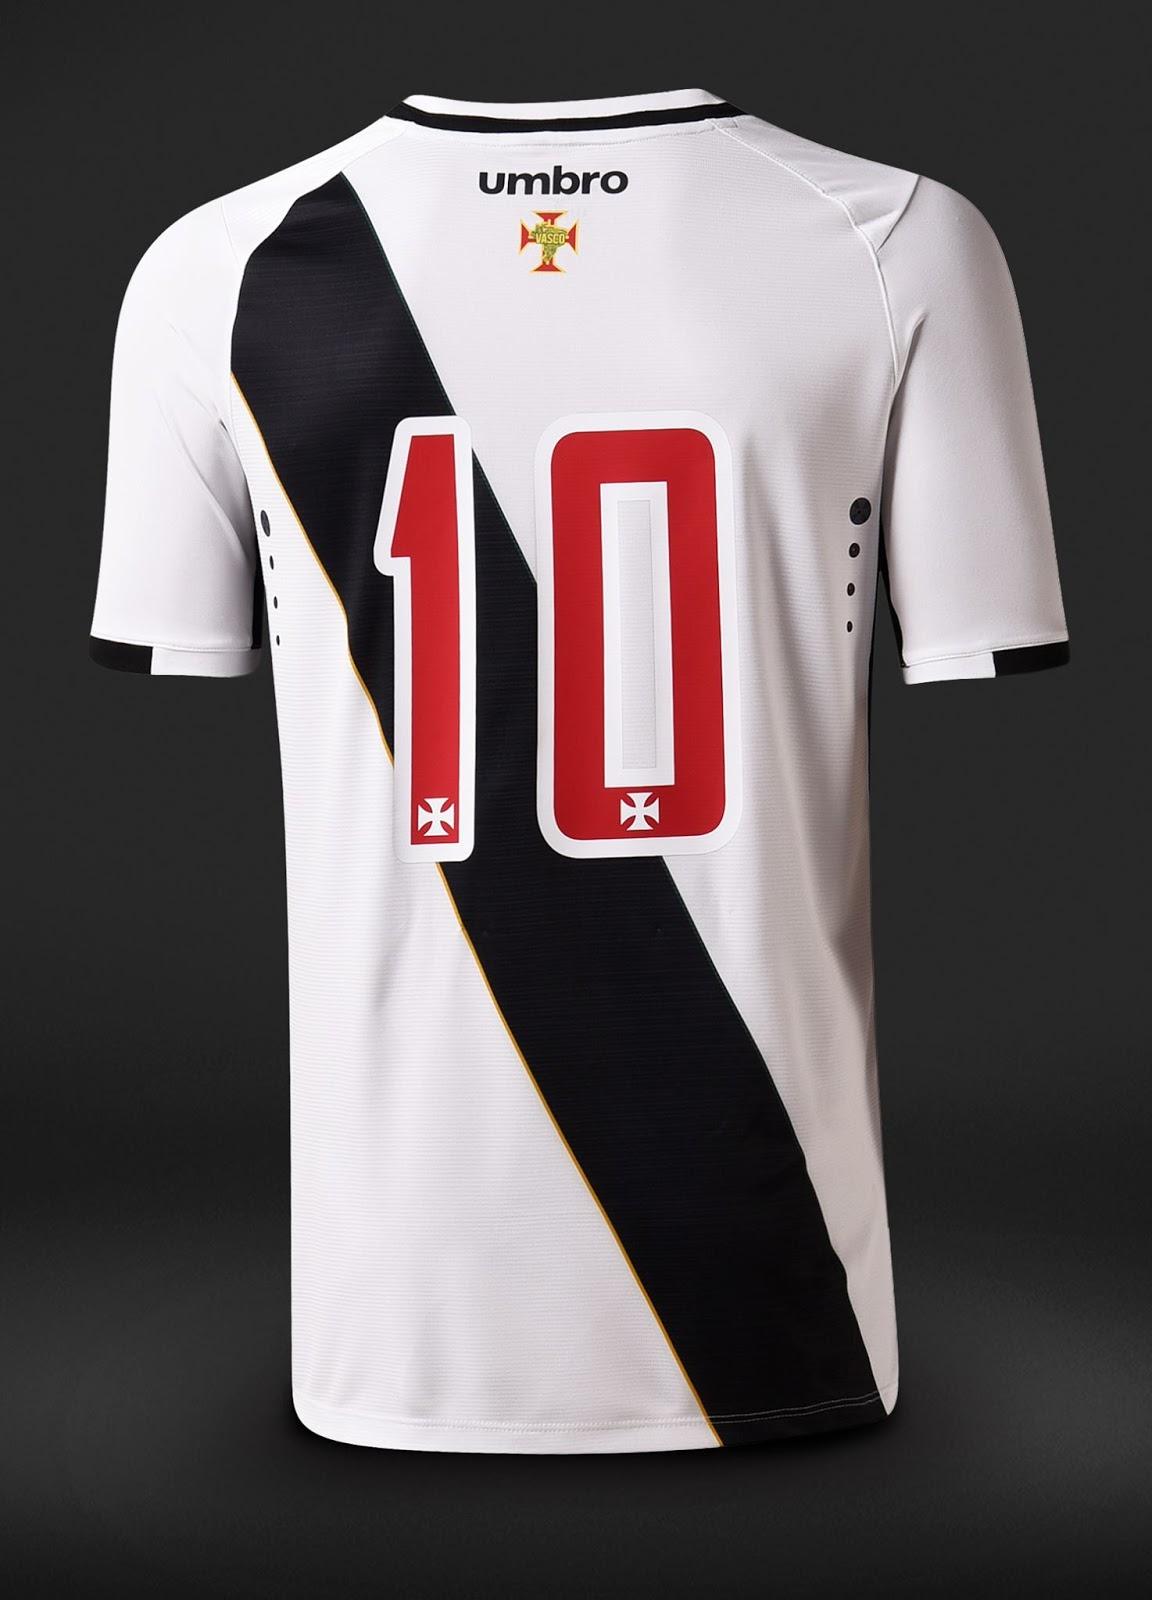 a00c4ac98 ... vasco-da-gama-16-17-kit-home-back. The white shirt ...